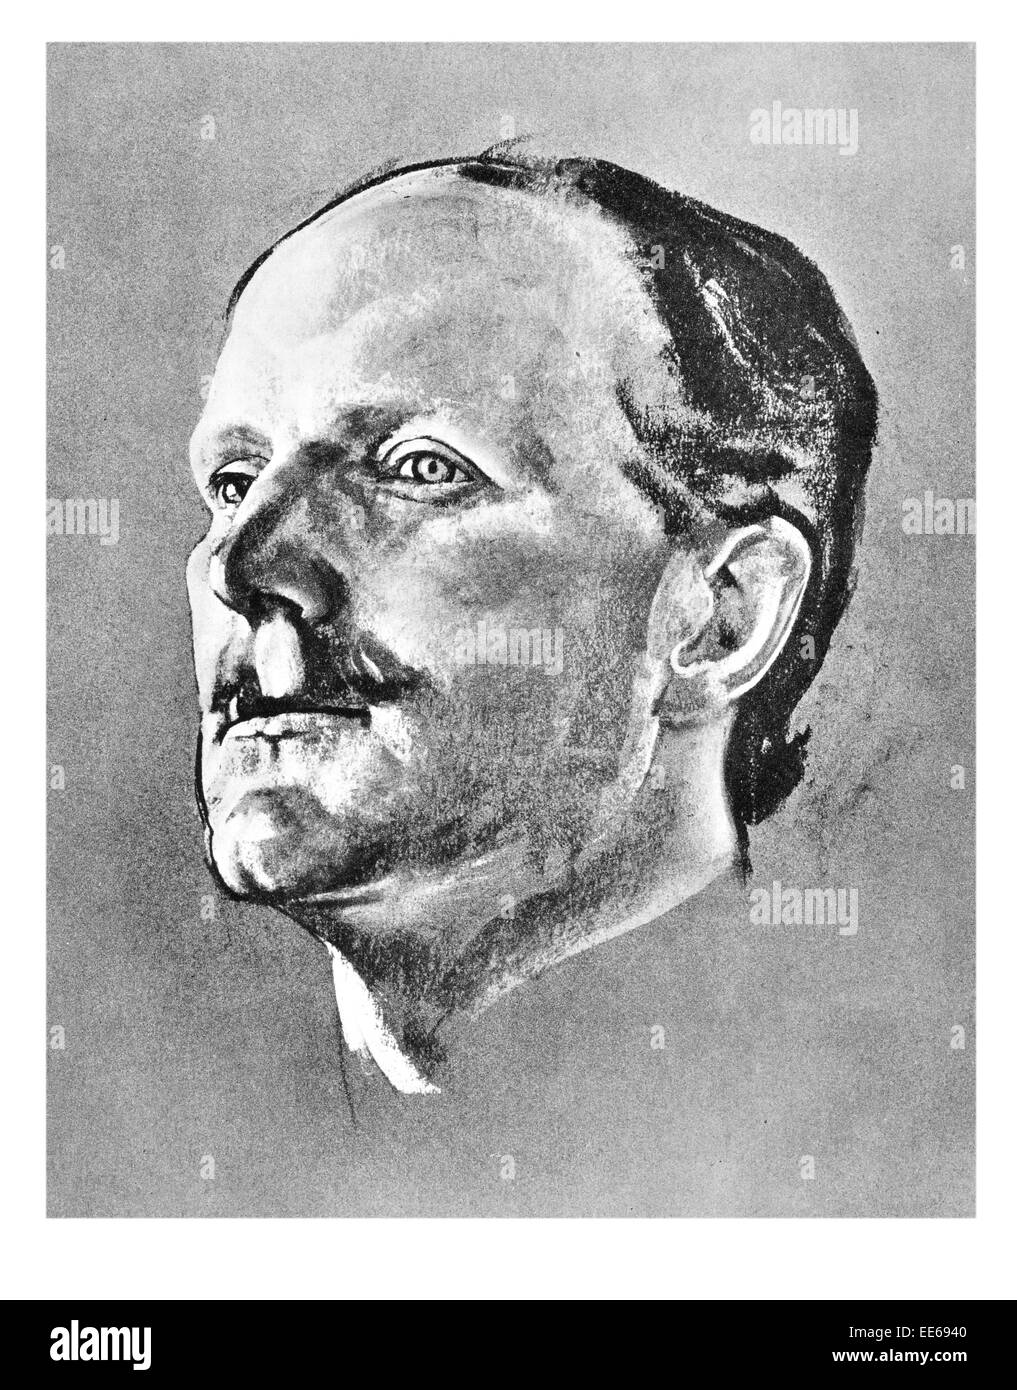 Sir Ronald Henry Amherst Storrs 19 November 1881 1 November 1955 British Foreign Colonial Office Arab revolt - Stock Image